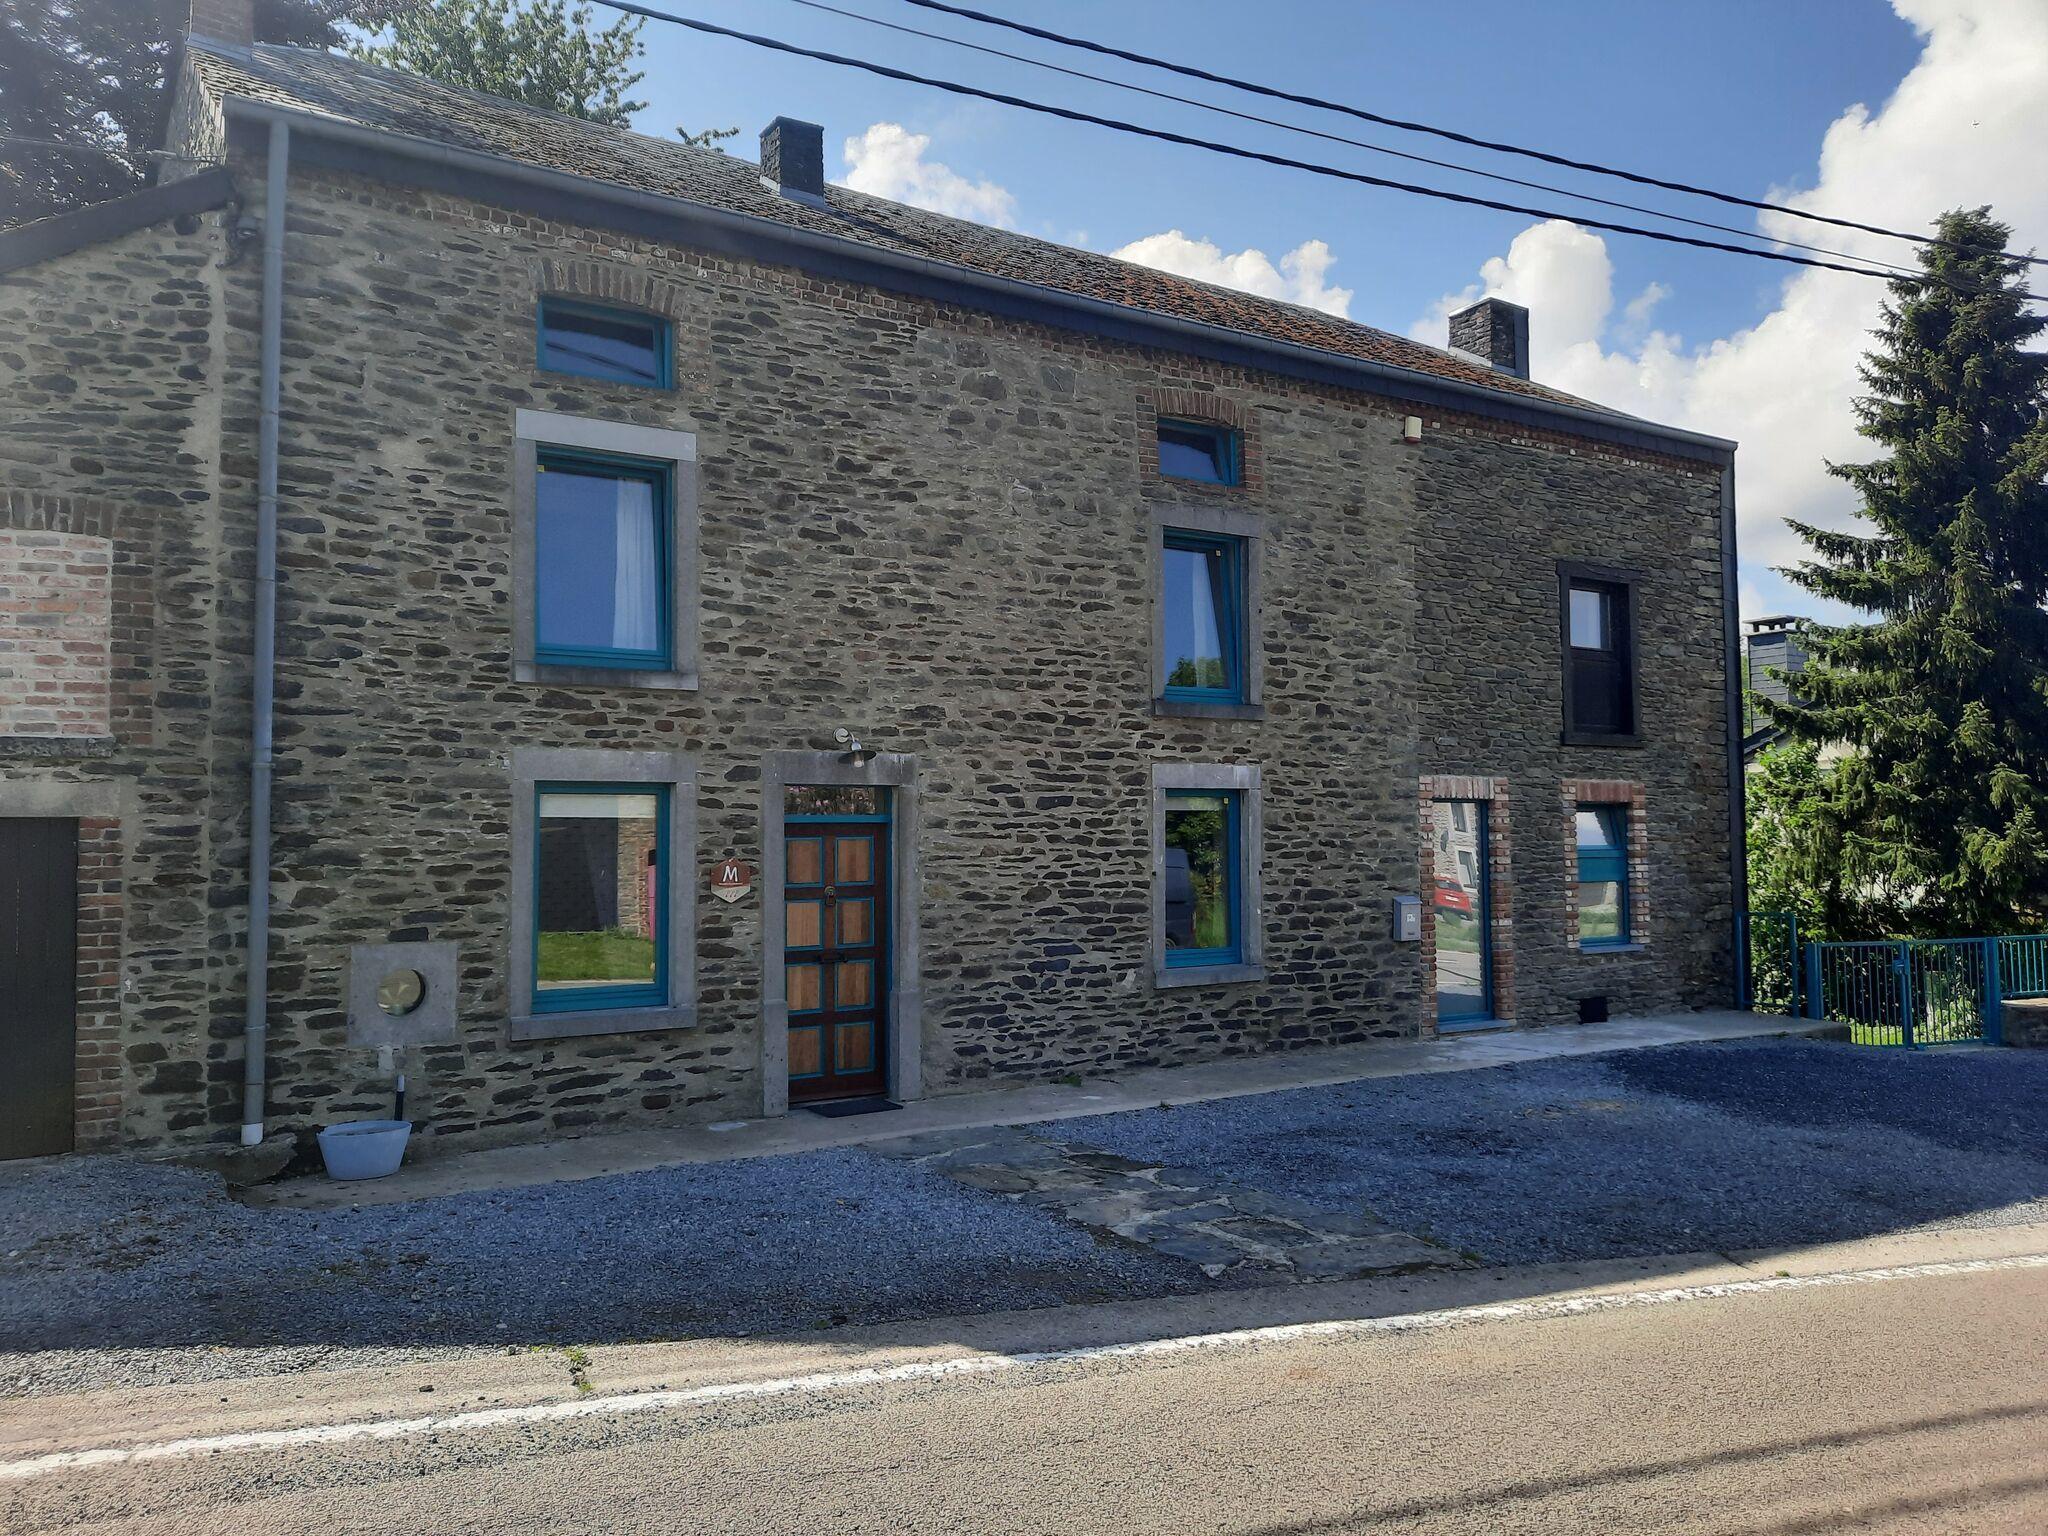 Vakantiewoning villa d 39 orchimont orchimont ardennen - Casa con piscina interna affitto ...